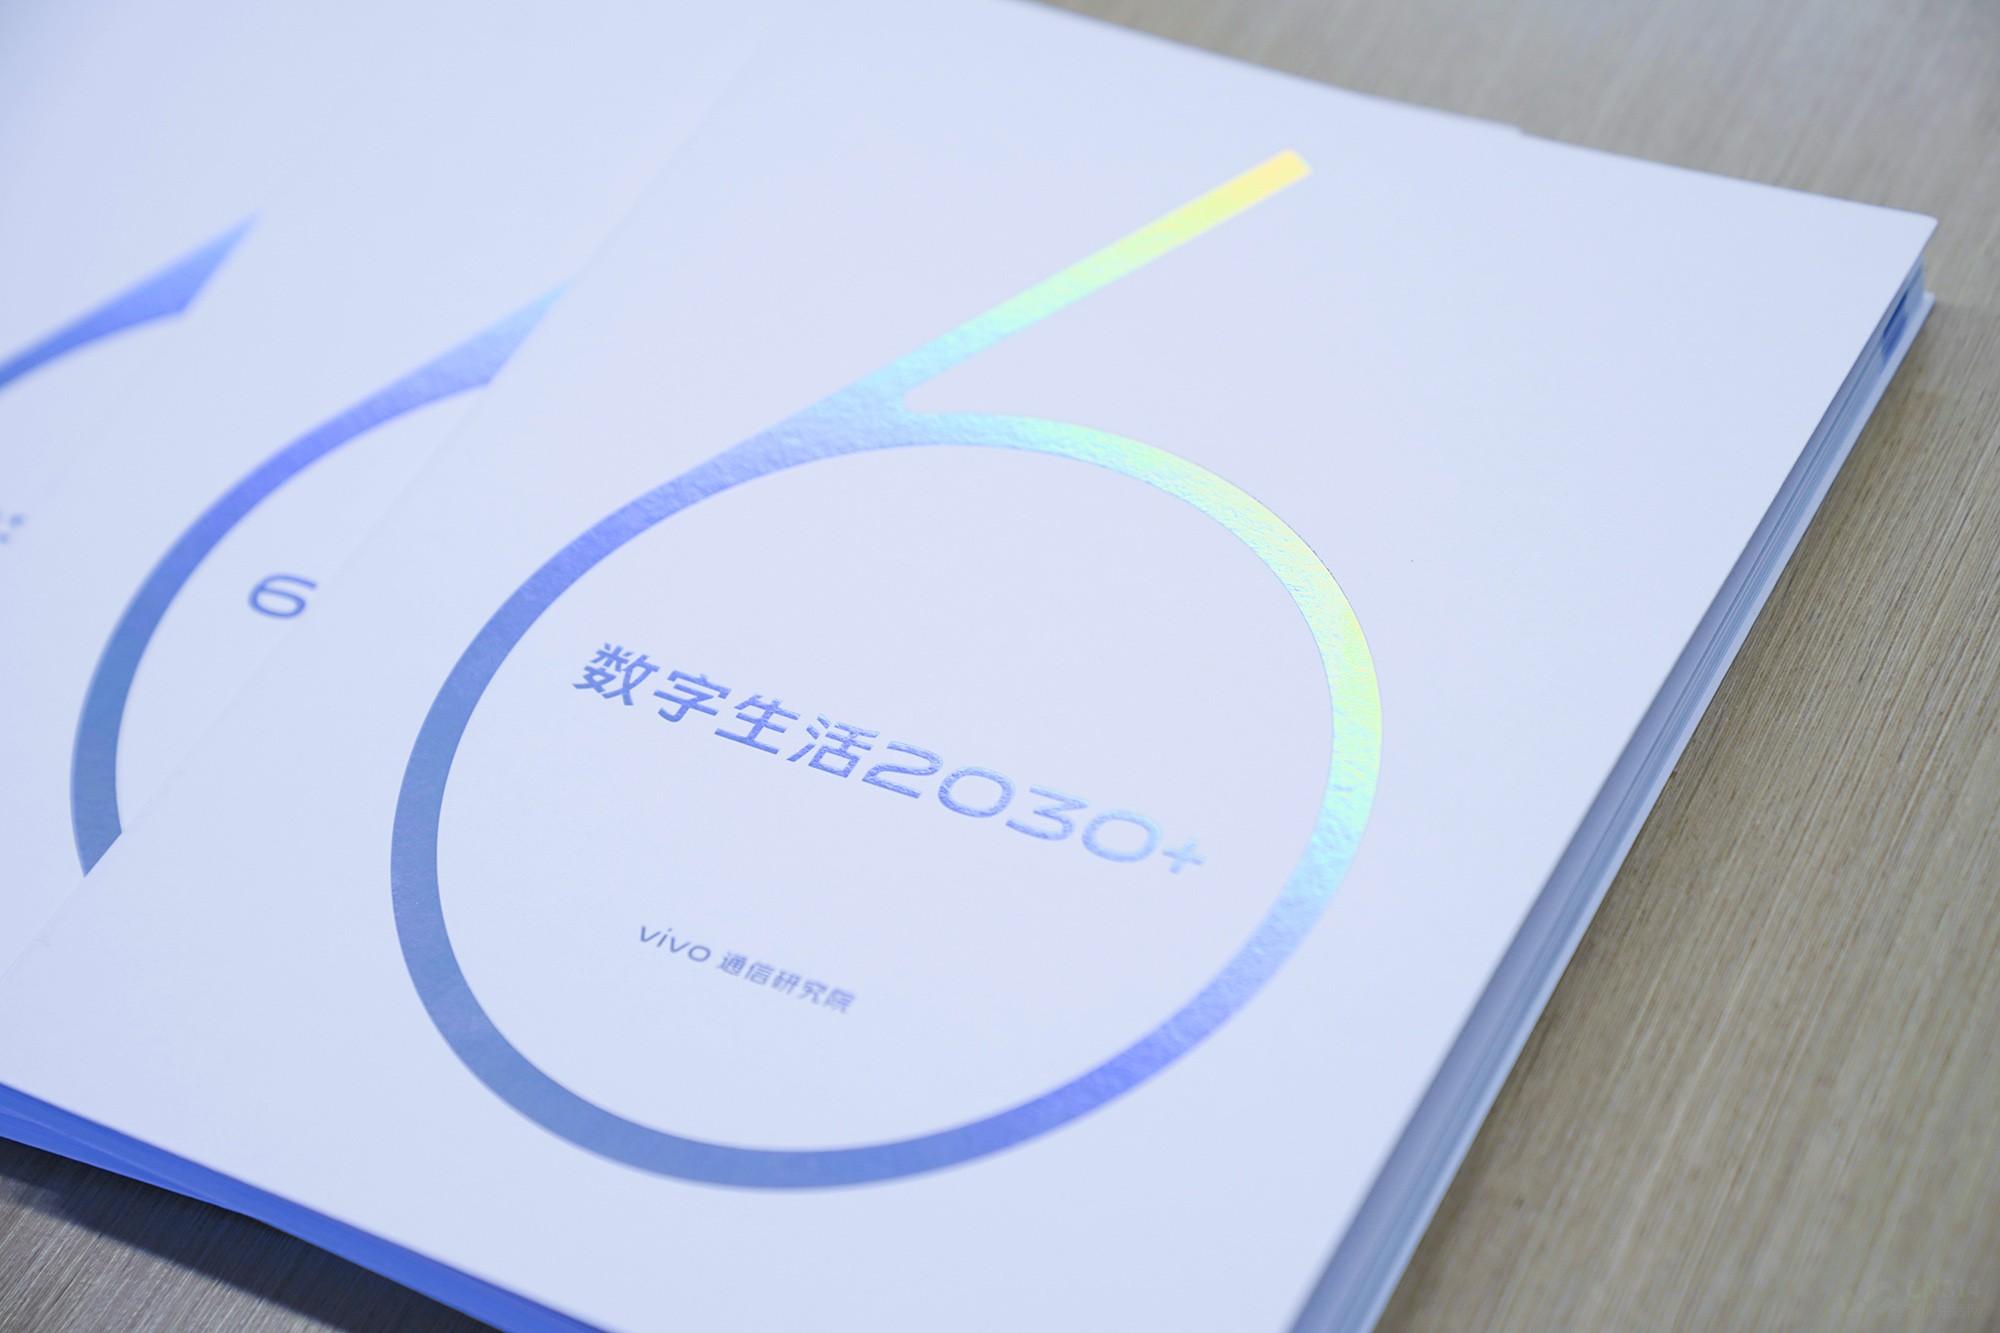 vivo通信研究院发布6G白皮书,畅想未来